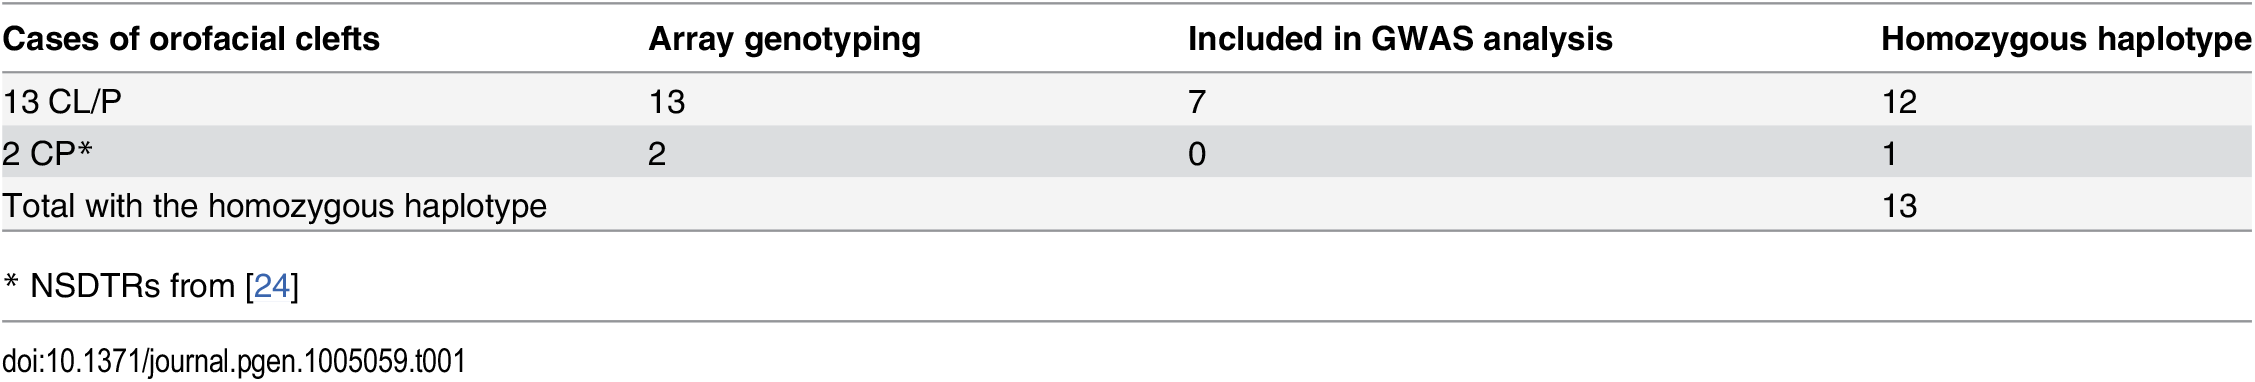 Summary of NSDTRs with the associated homozygous haplotype on CFA27.